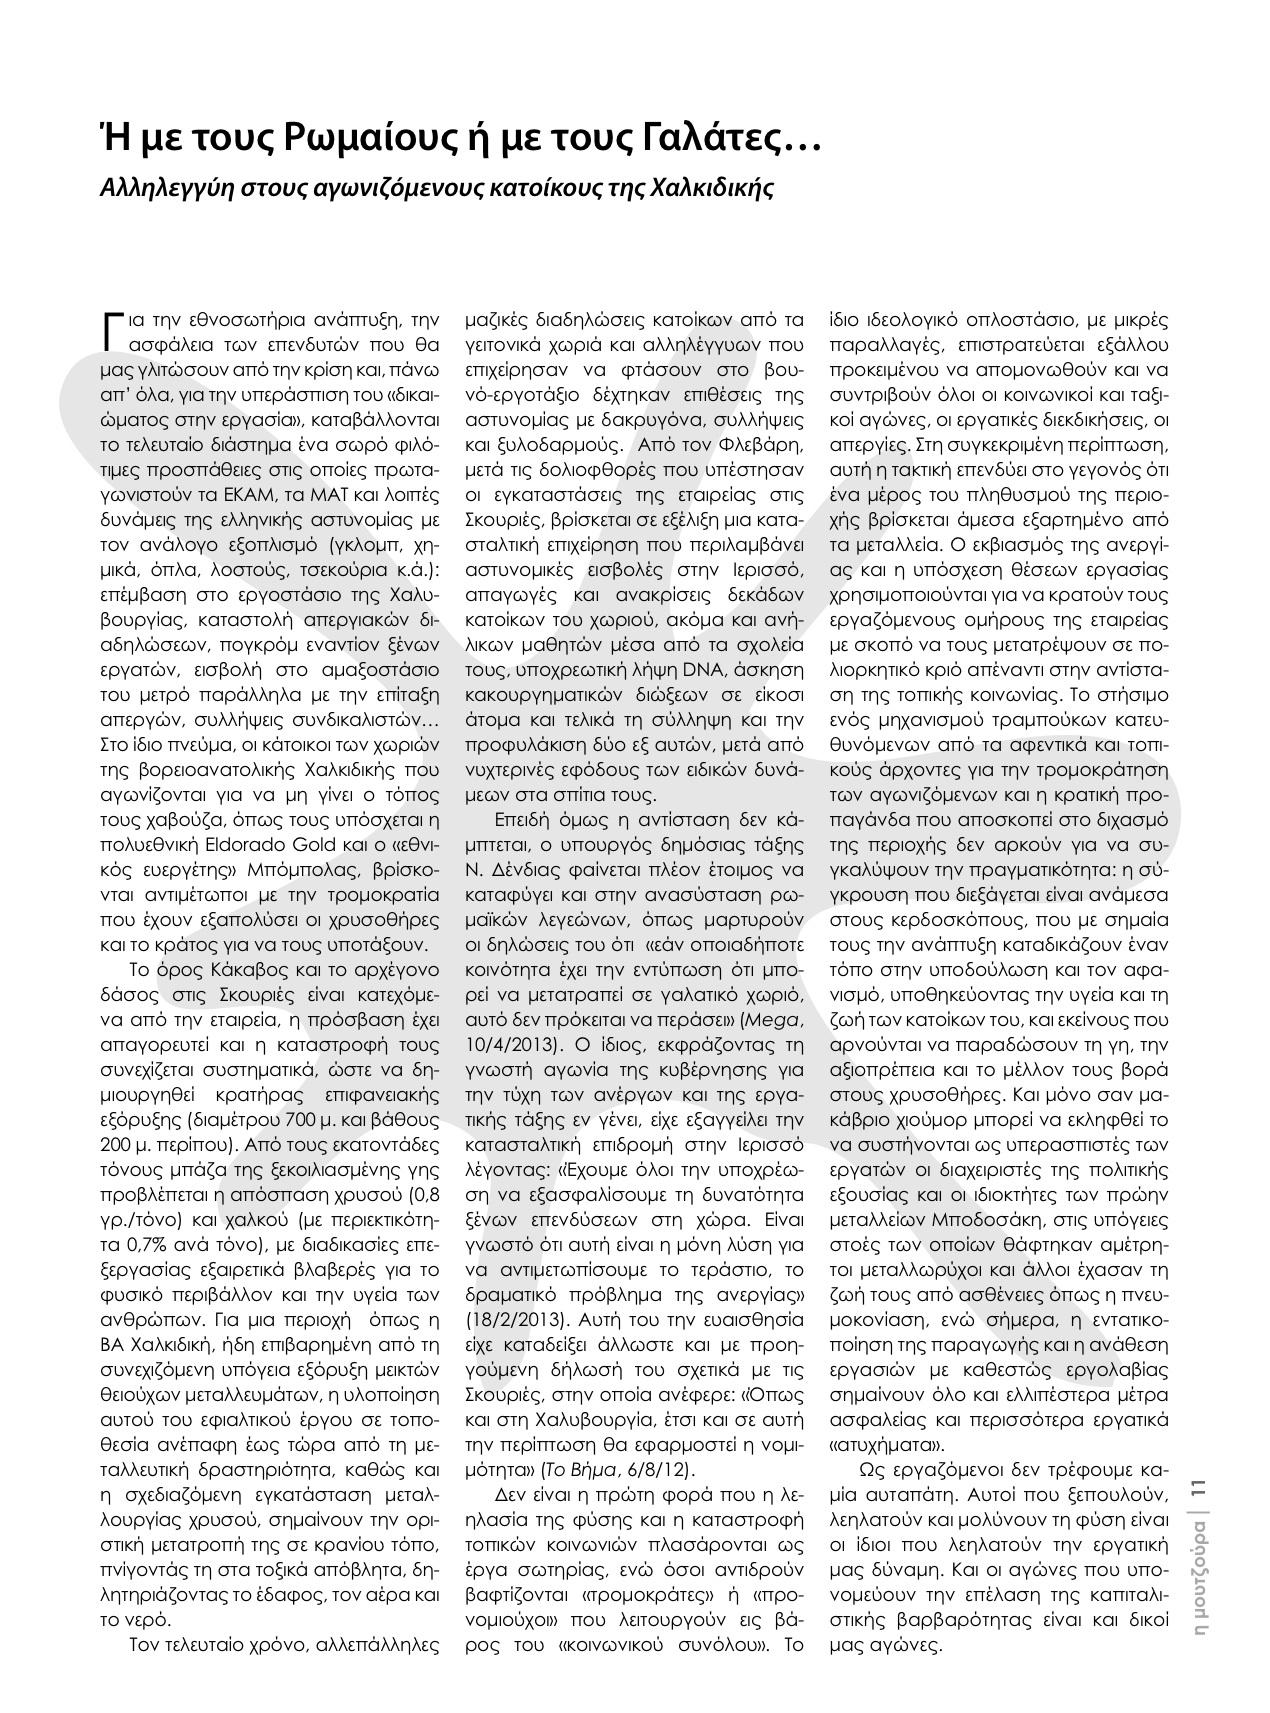 http://soshalkidiki.files.wordpress.com/2013/05/smed_moutzoura01_april13_web.jpg